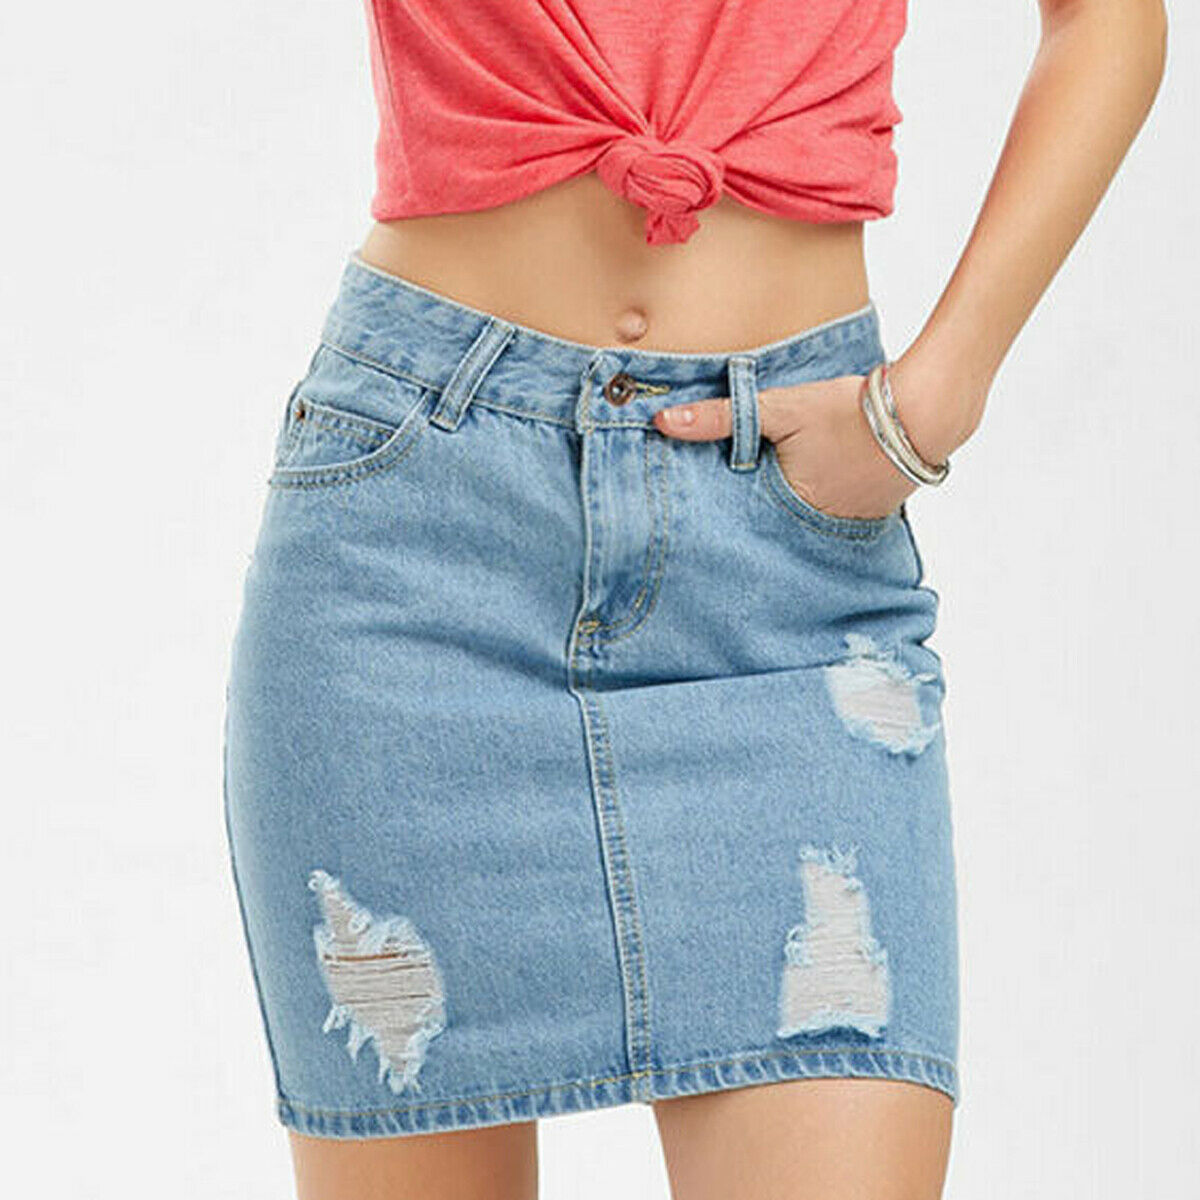 2019 Women Summer Slim High Waist Ripped Skirt Fashion Ladies Faded Denim Jean Bodycon Short Mini Pencil Skirt